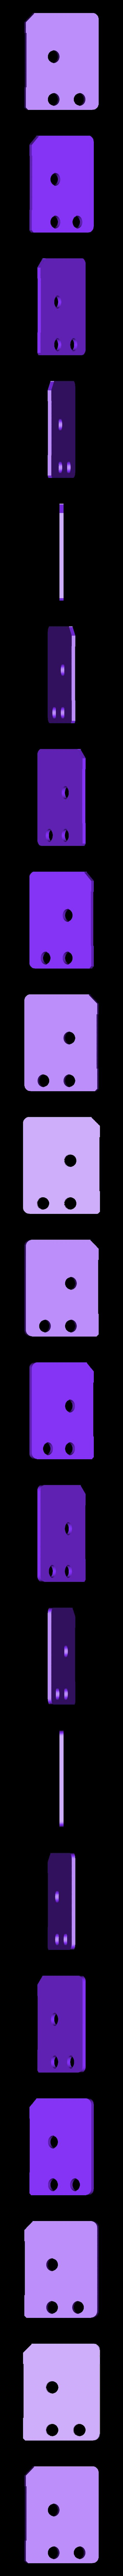 patch2 (1pcs).STL Download STL file Folding Quadcopter 450 Frame • 3D print object, AleksandrDolzhenko